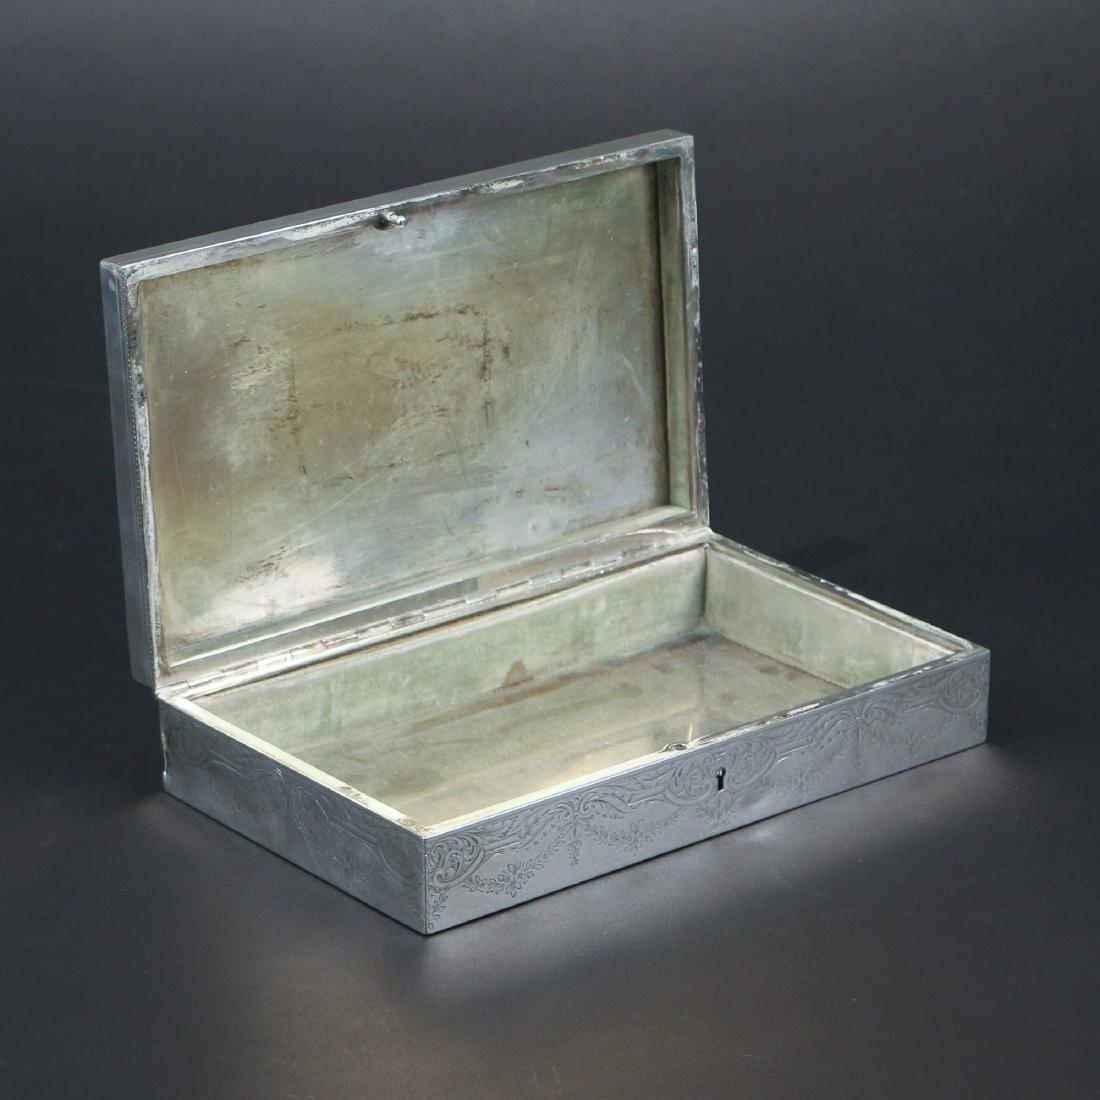 HOWARD & CO. STERLING SILVER JEWELRY BOX - 3